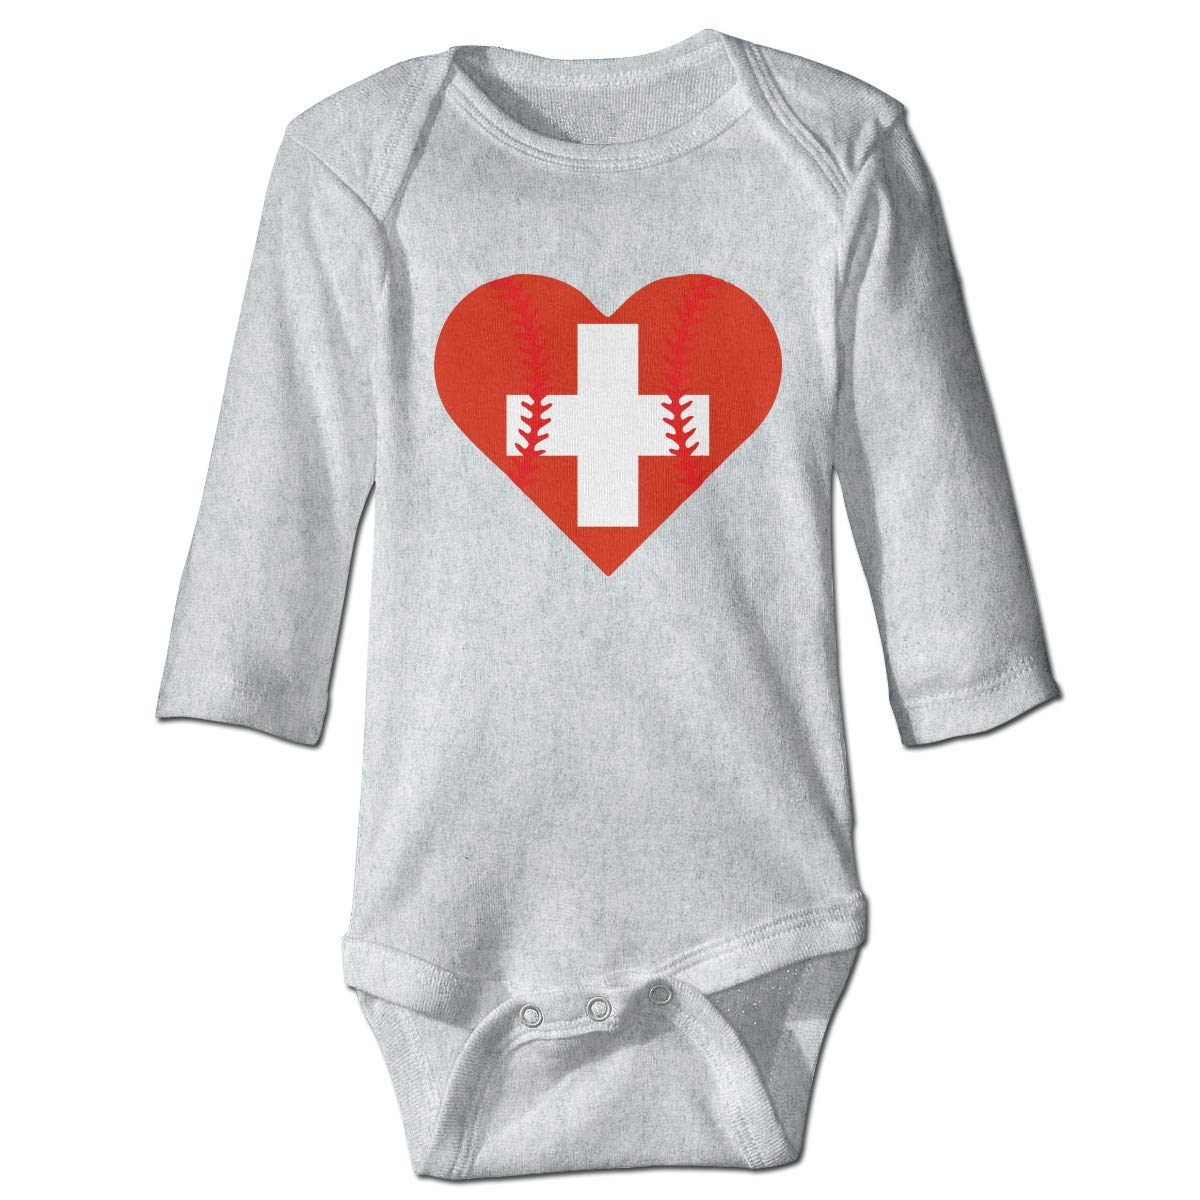 A14UBP Infant Babys Long Sleeve Jumpsuit Romper Switzerland Flag Baseball Heart Unisex Button Playsuit Outfit Clothes